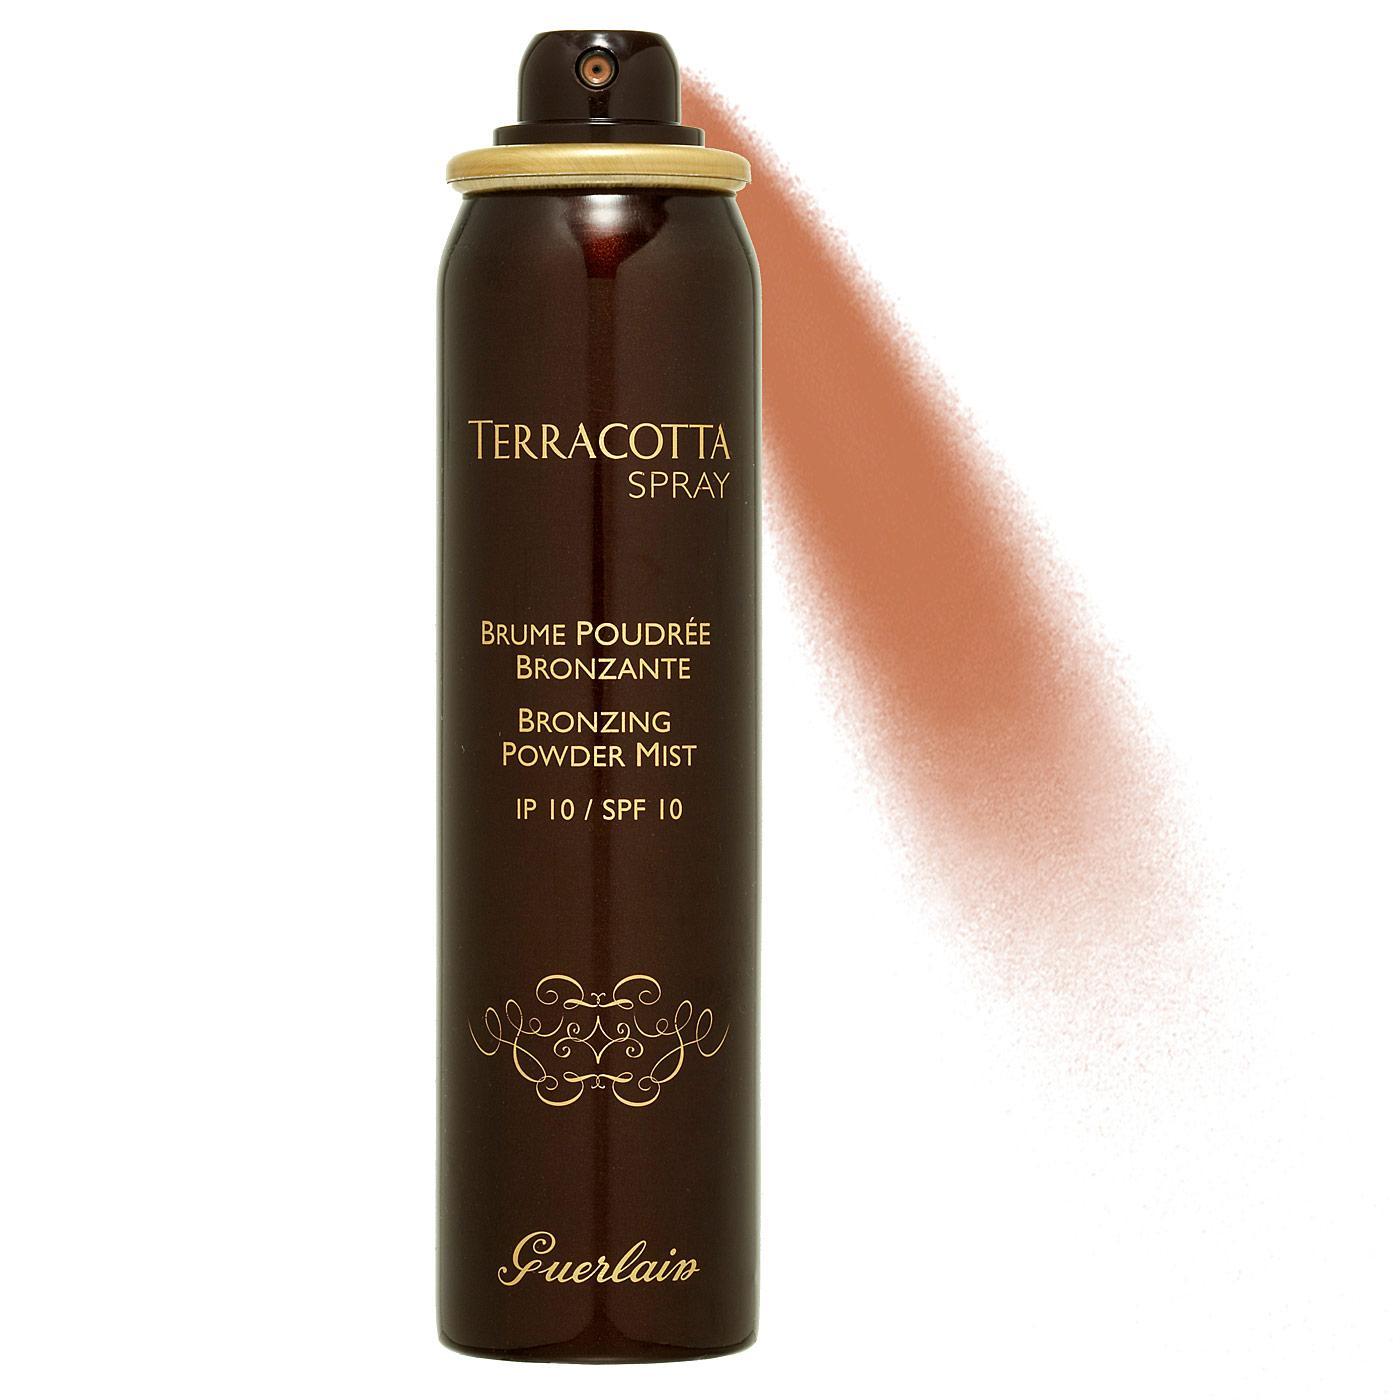 Terracotta Spray SPF 10